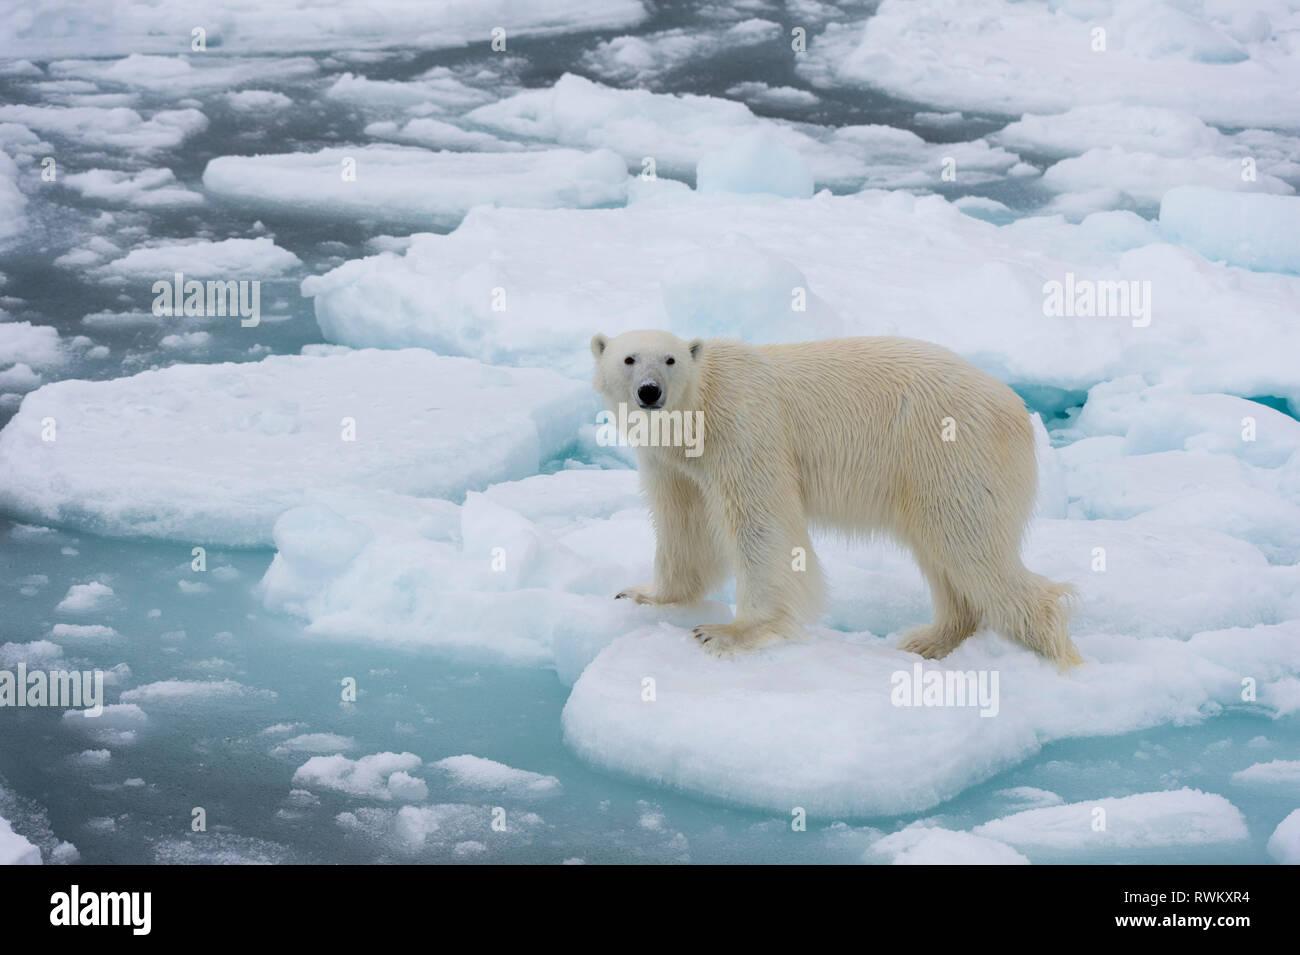 Polar bear (Ursus maritimus), Polar Ice Cap, 81north of Spitsbergen, Norway - Stock Image